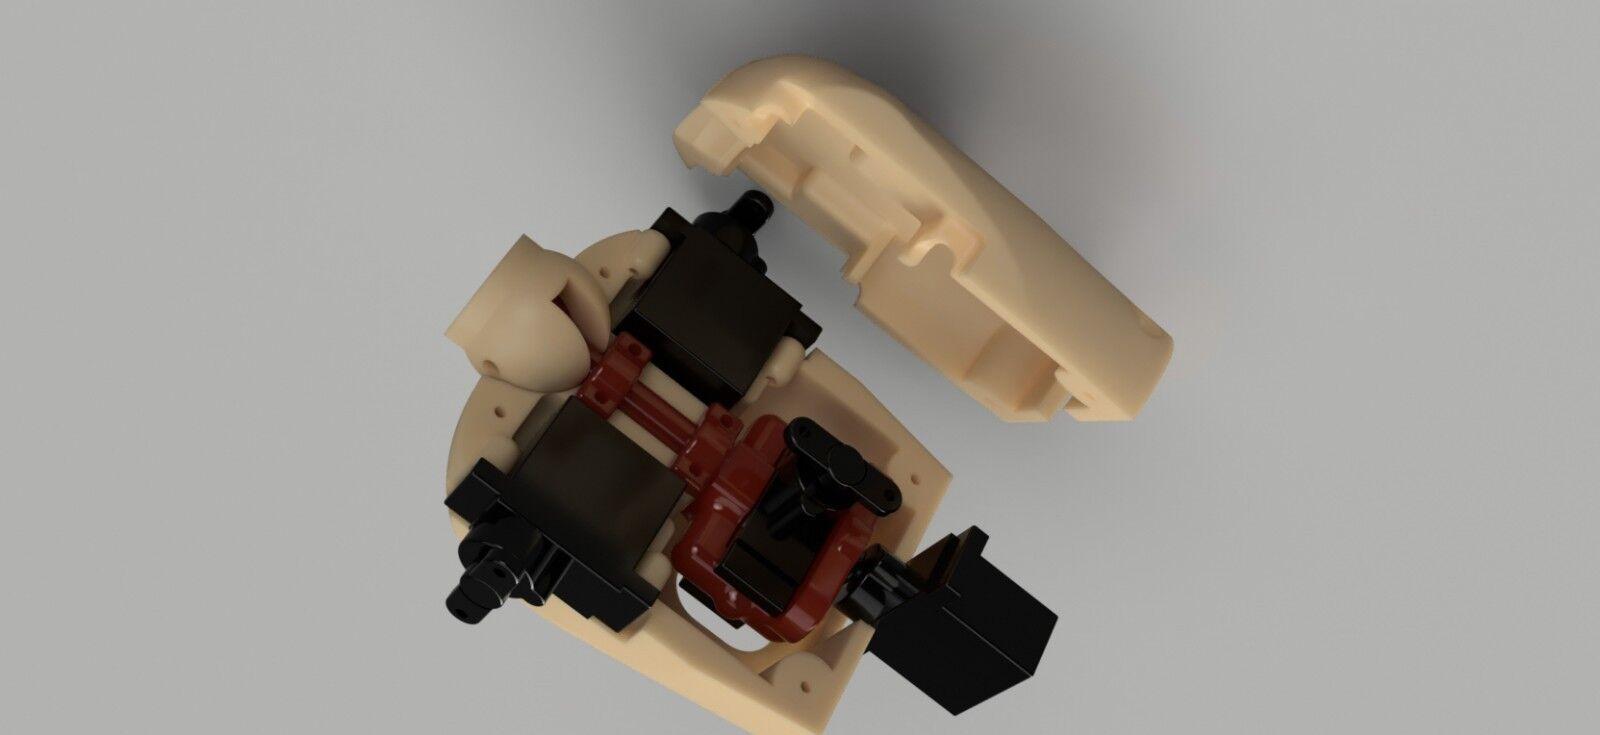 1   5 - skala animiert conversion kits - jets panzer, hubschrauber heli - Stiefel